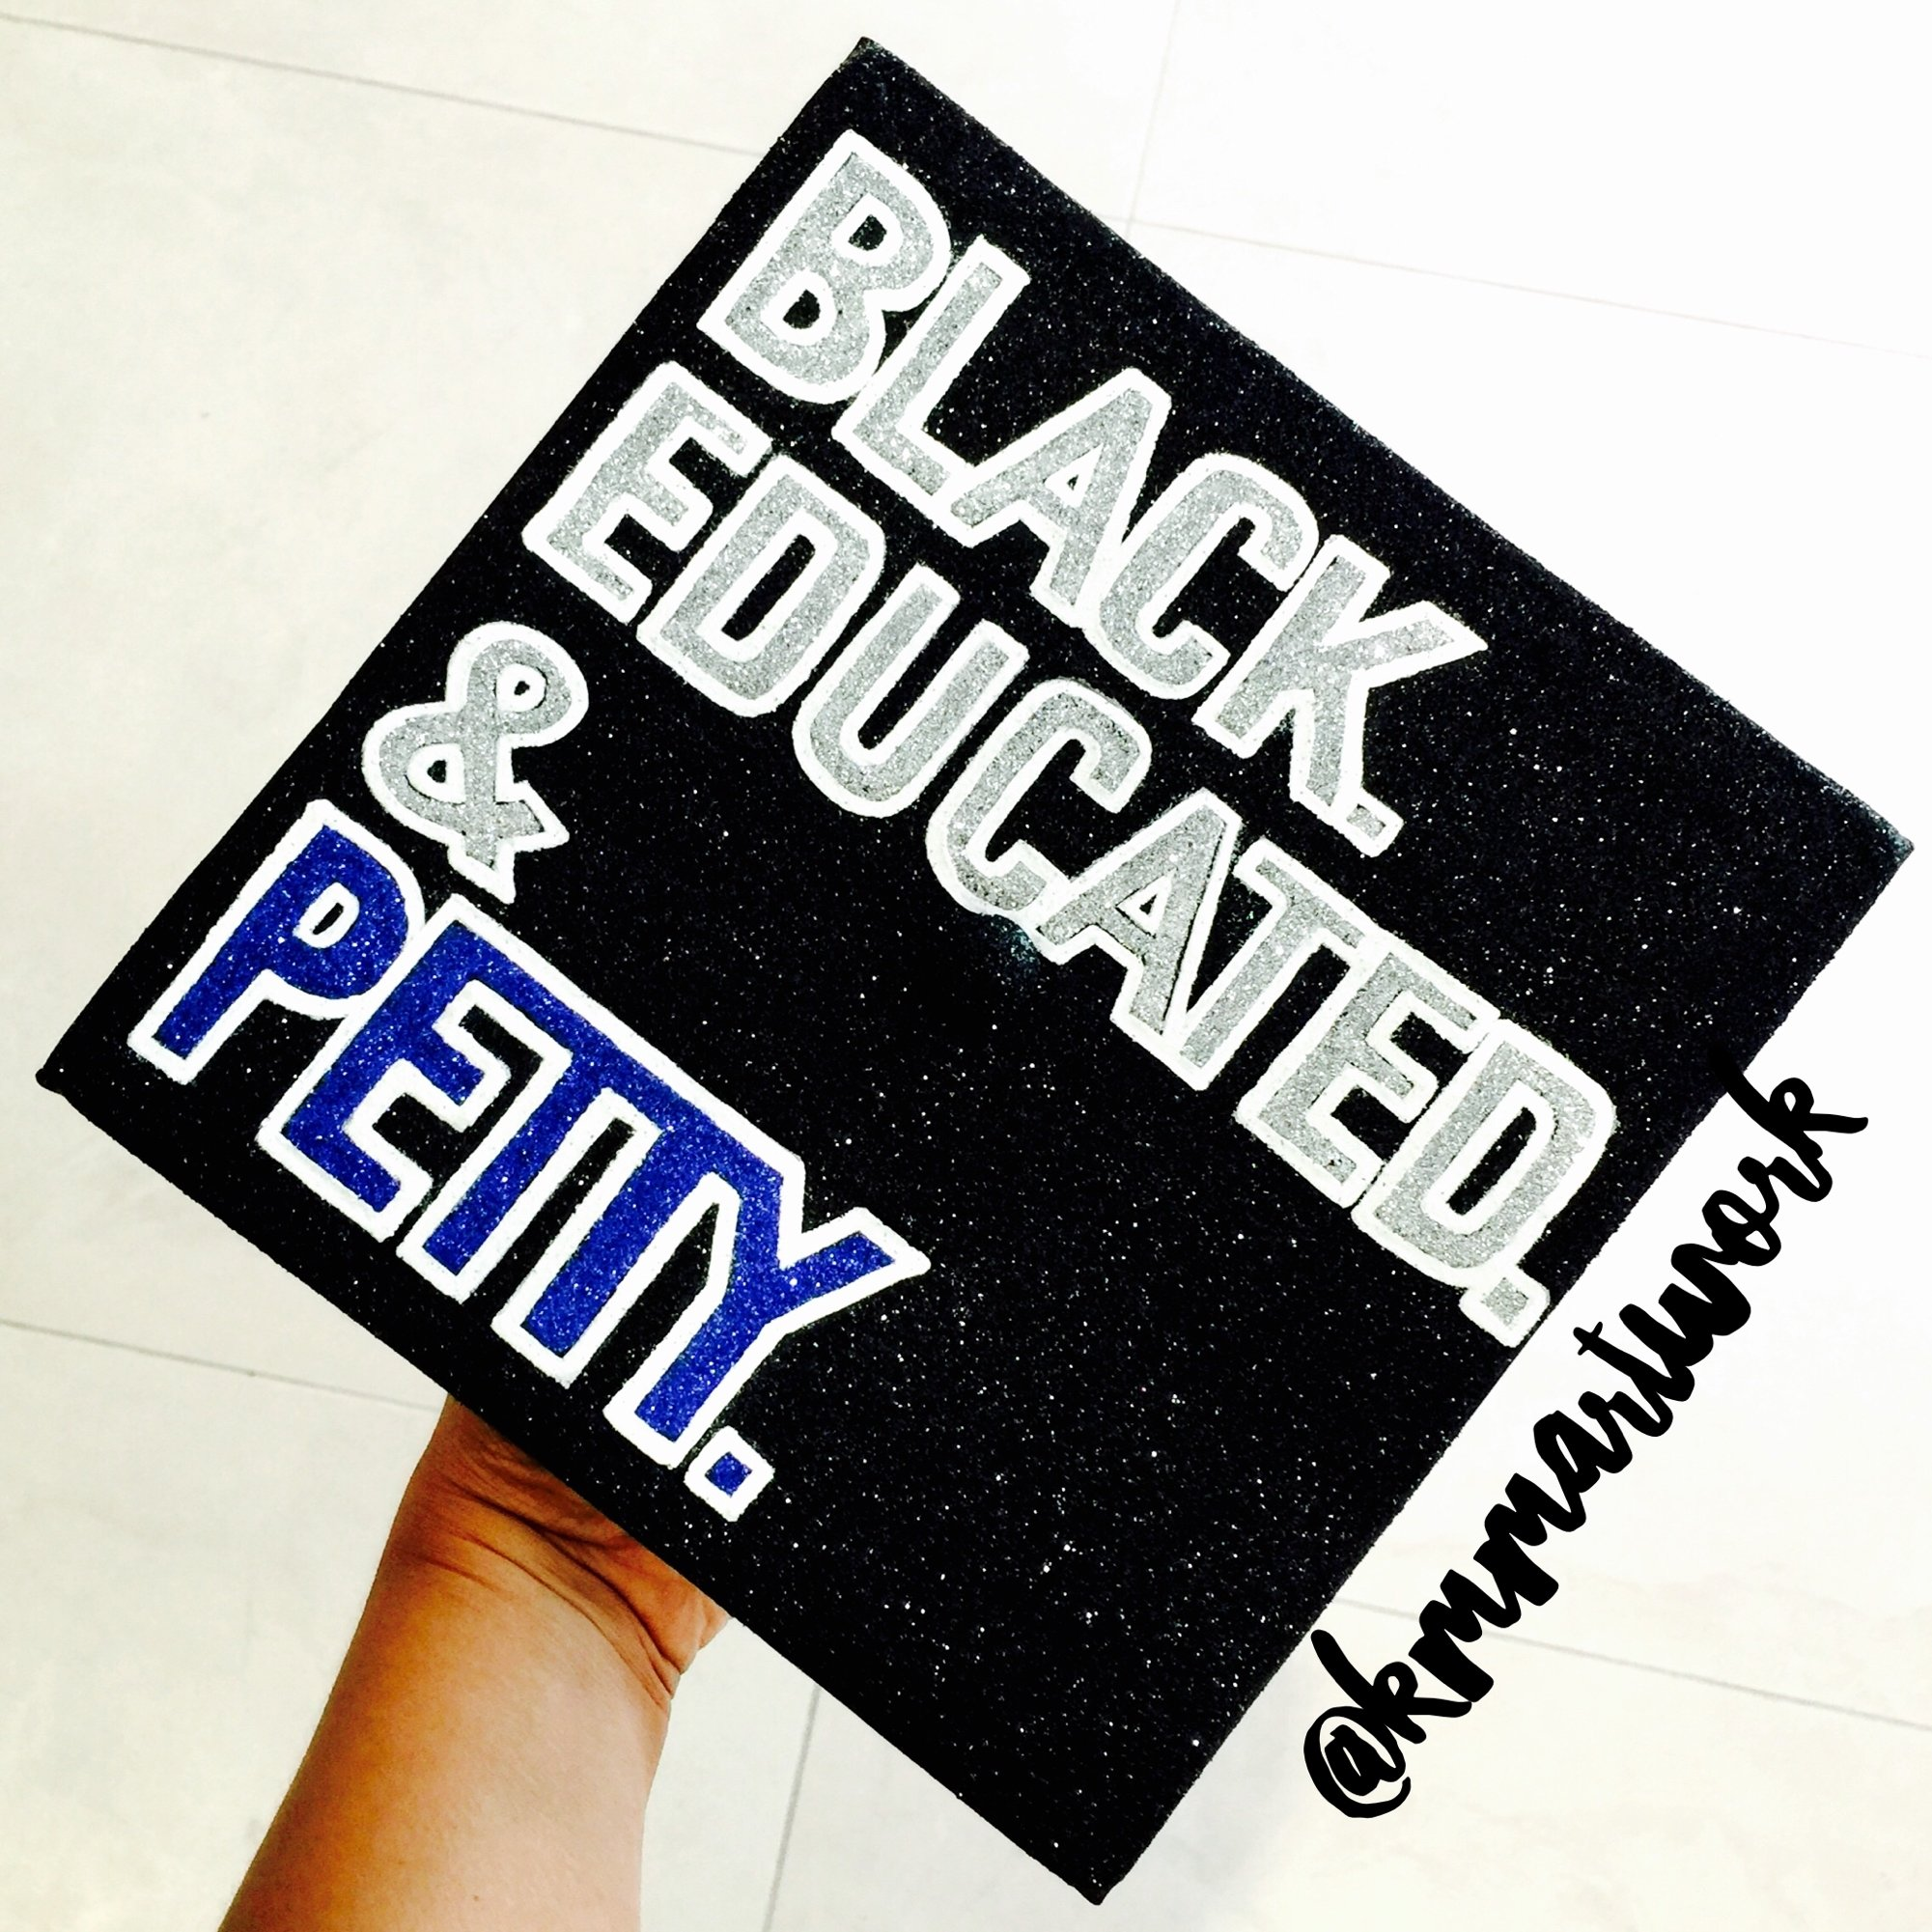 10 Lovely High School Graduation Cap Decoration Ideas black educated petty graduation cap design inspired graduation 2020